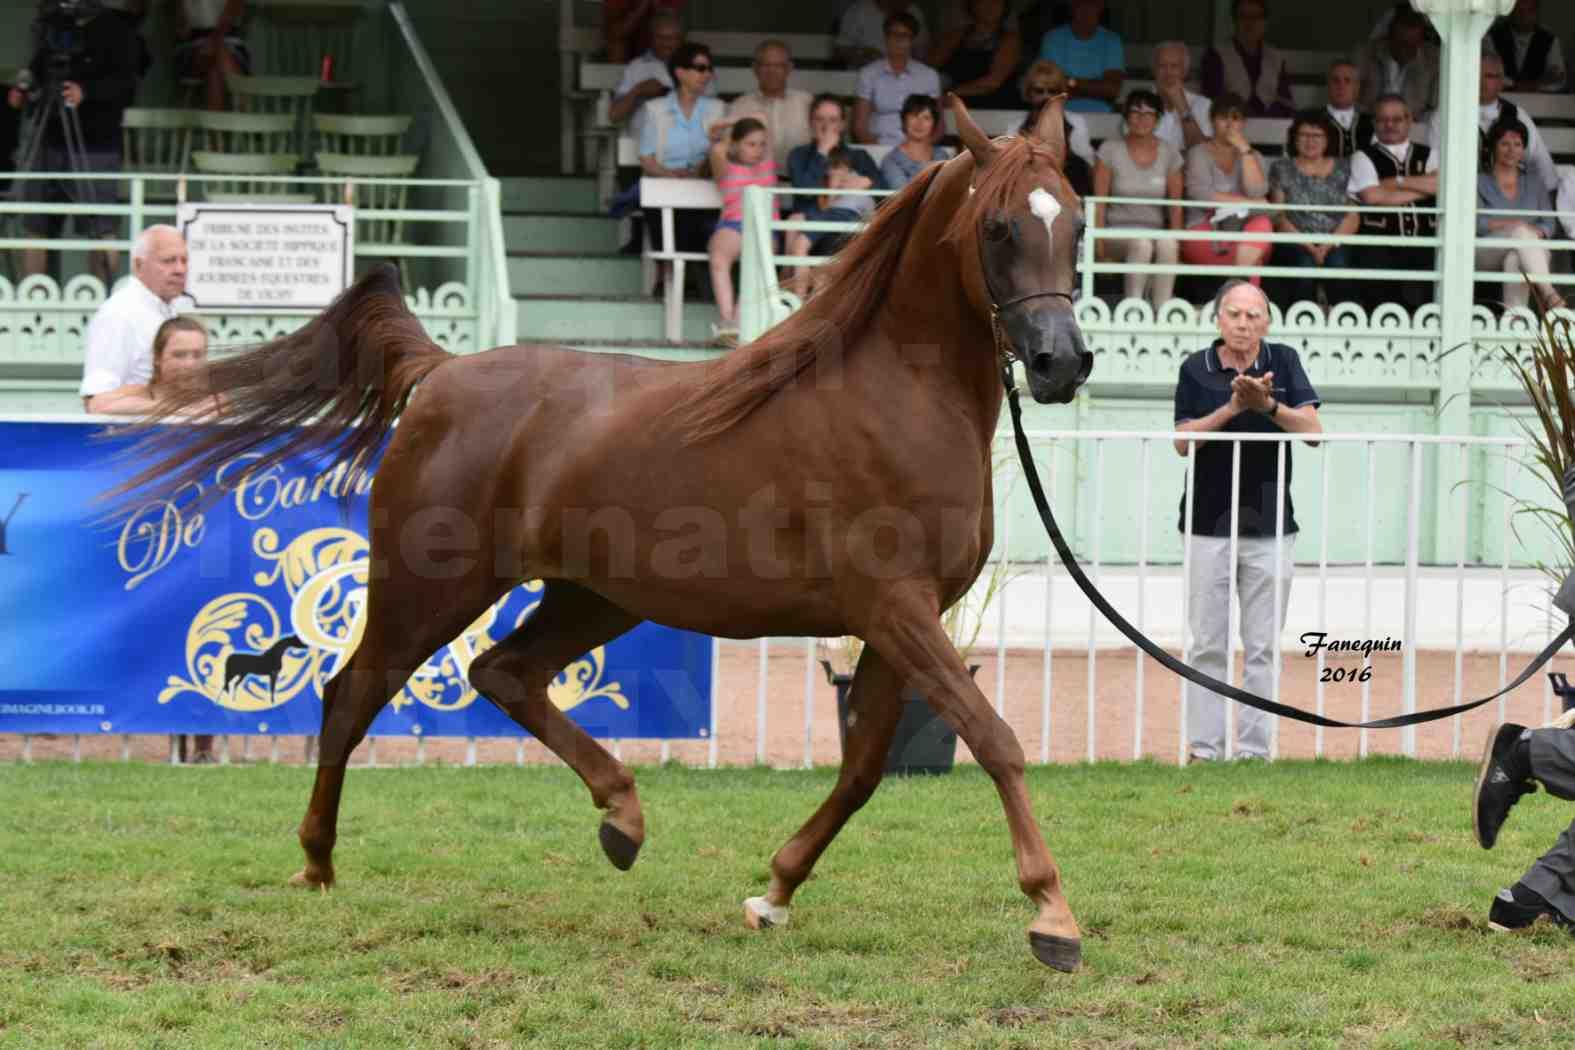 International Arabian Horse Show B de VICHY 2016 - PEARL DE DJOON - Notre Sélection - 12